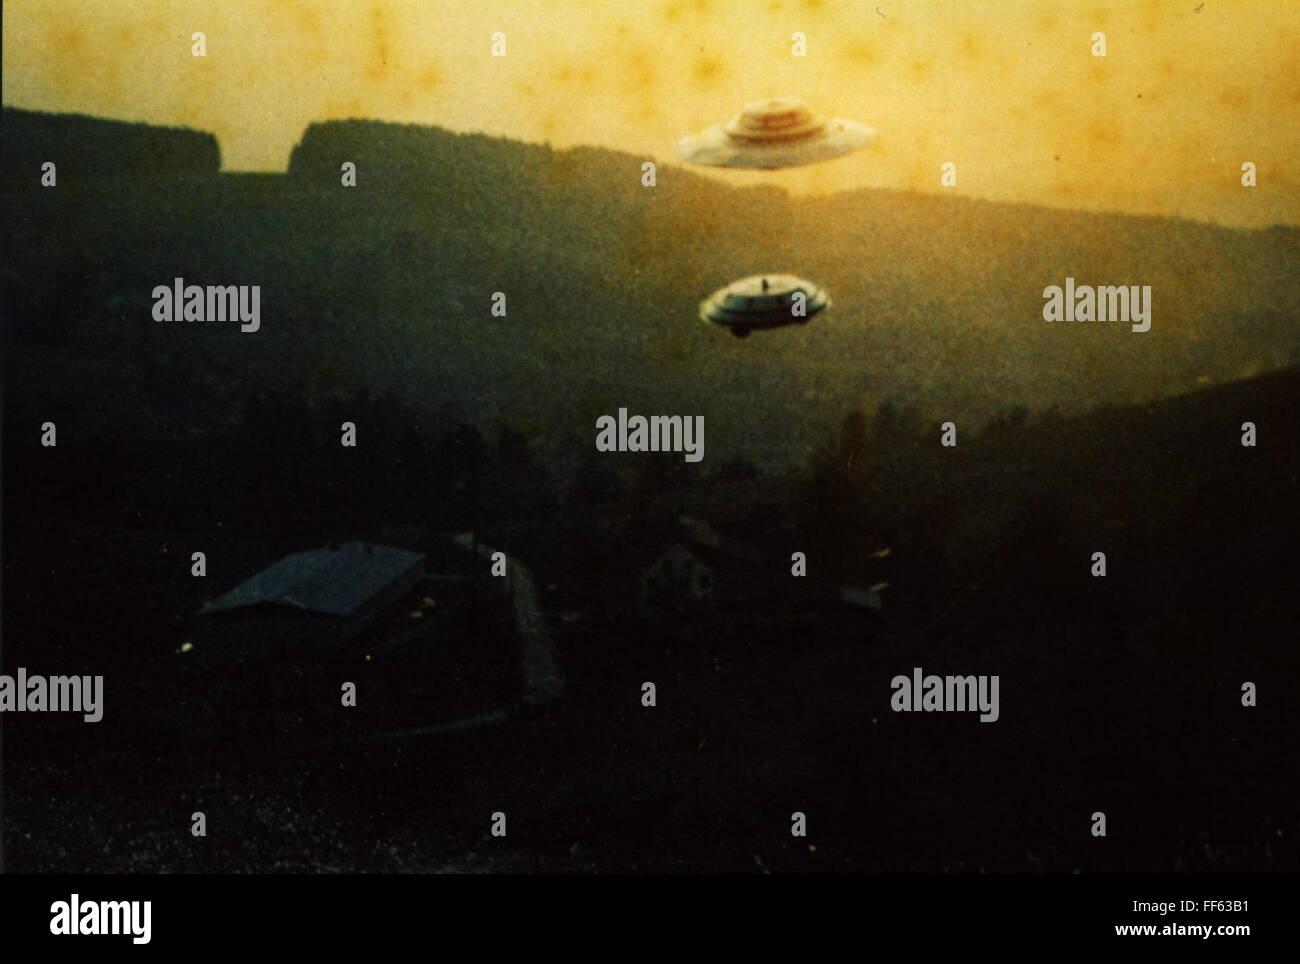 astronautics, unidentified flying object (UFO), flying ufo, Zeleg Bettswil, Switzerland, 3.3.1975, Additional-Rights - Stock Image